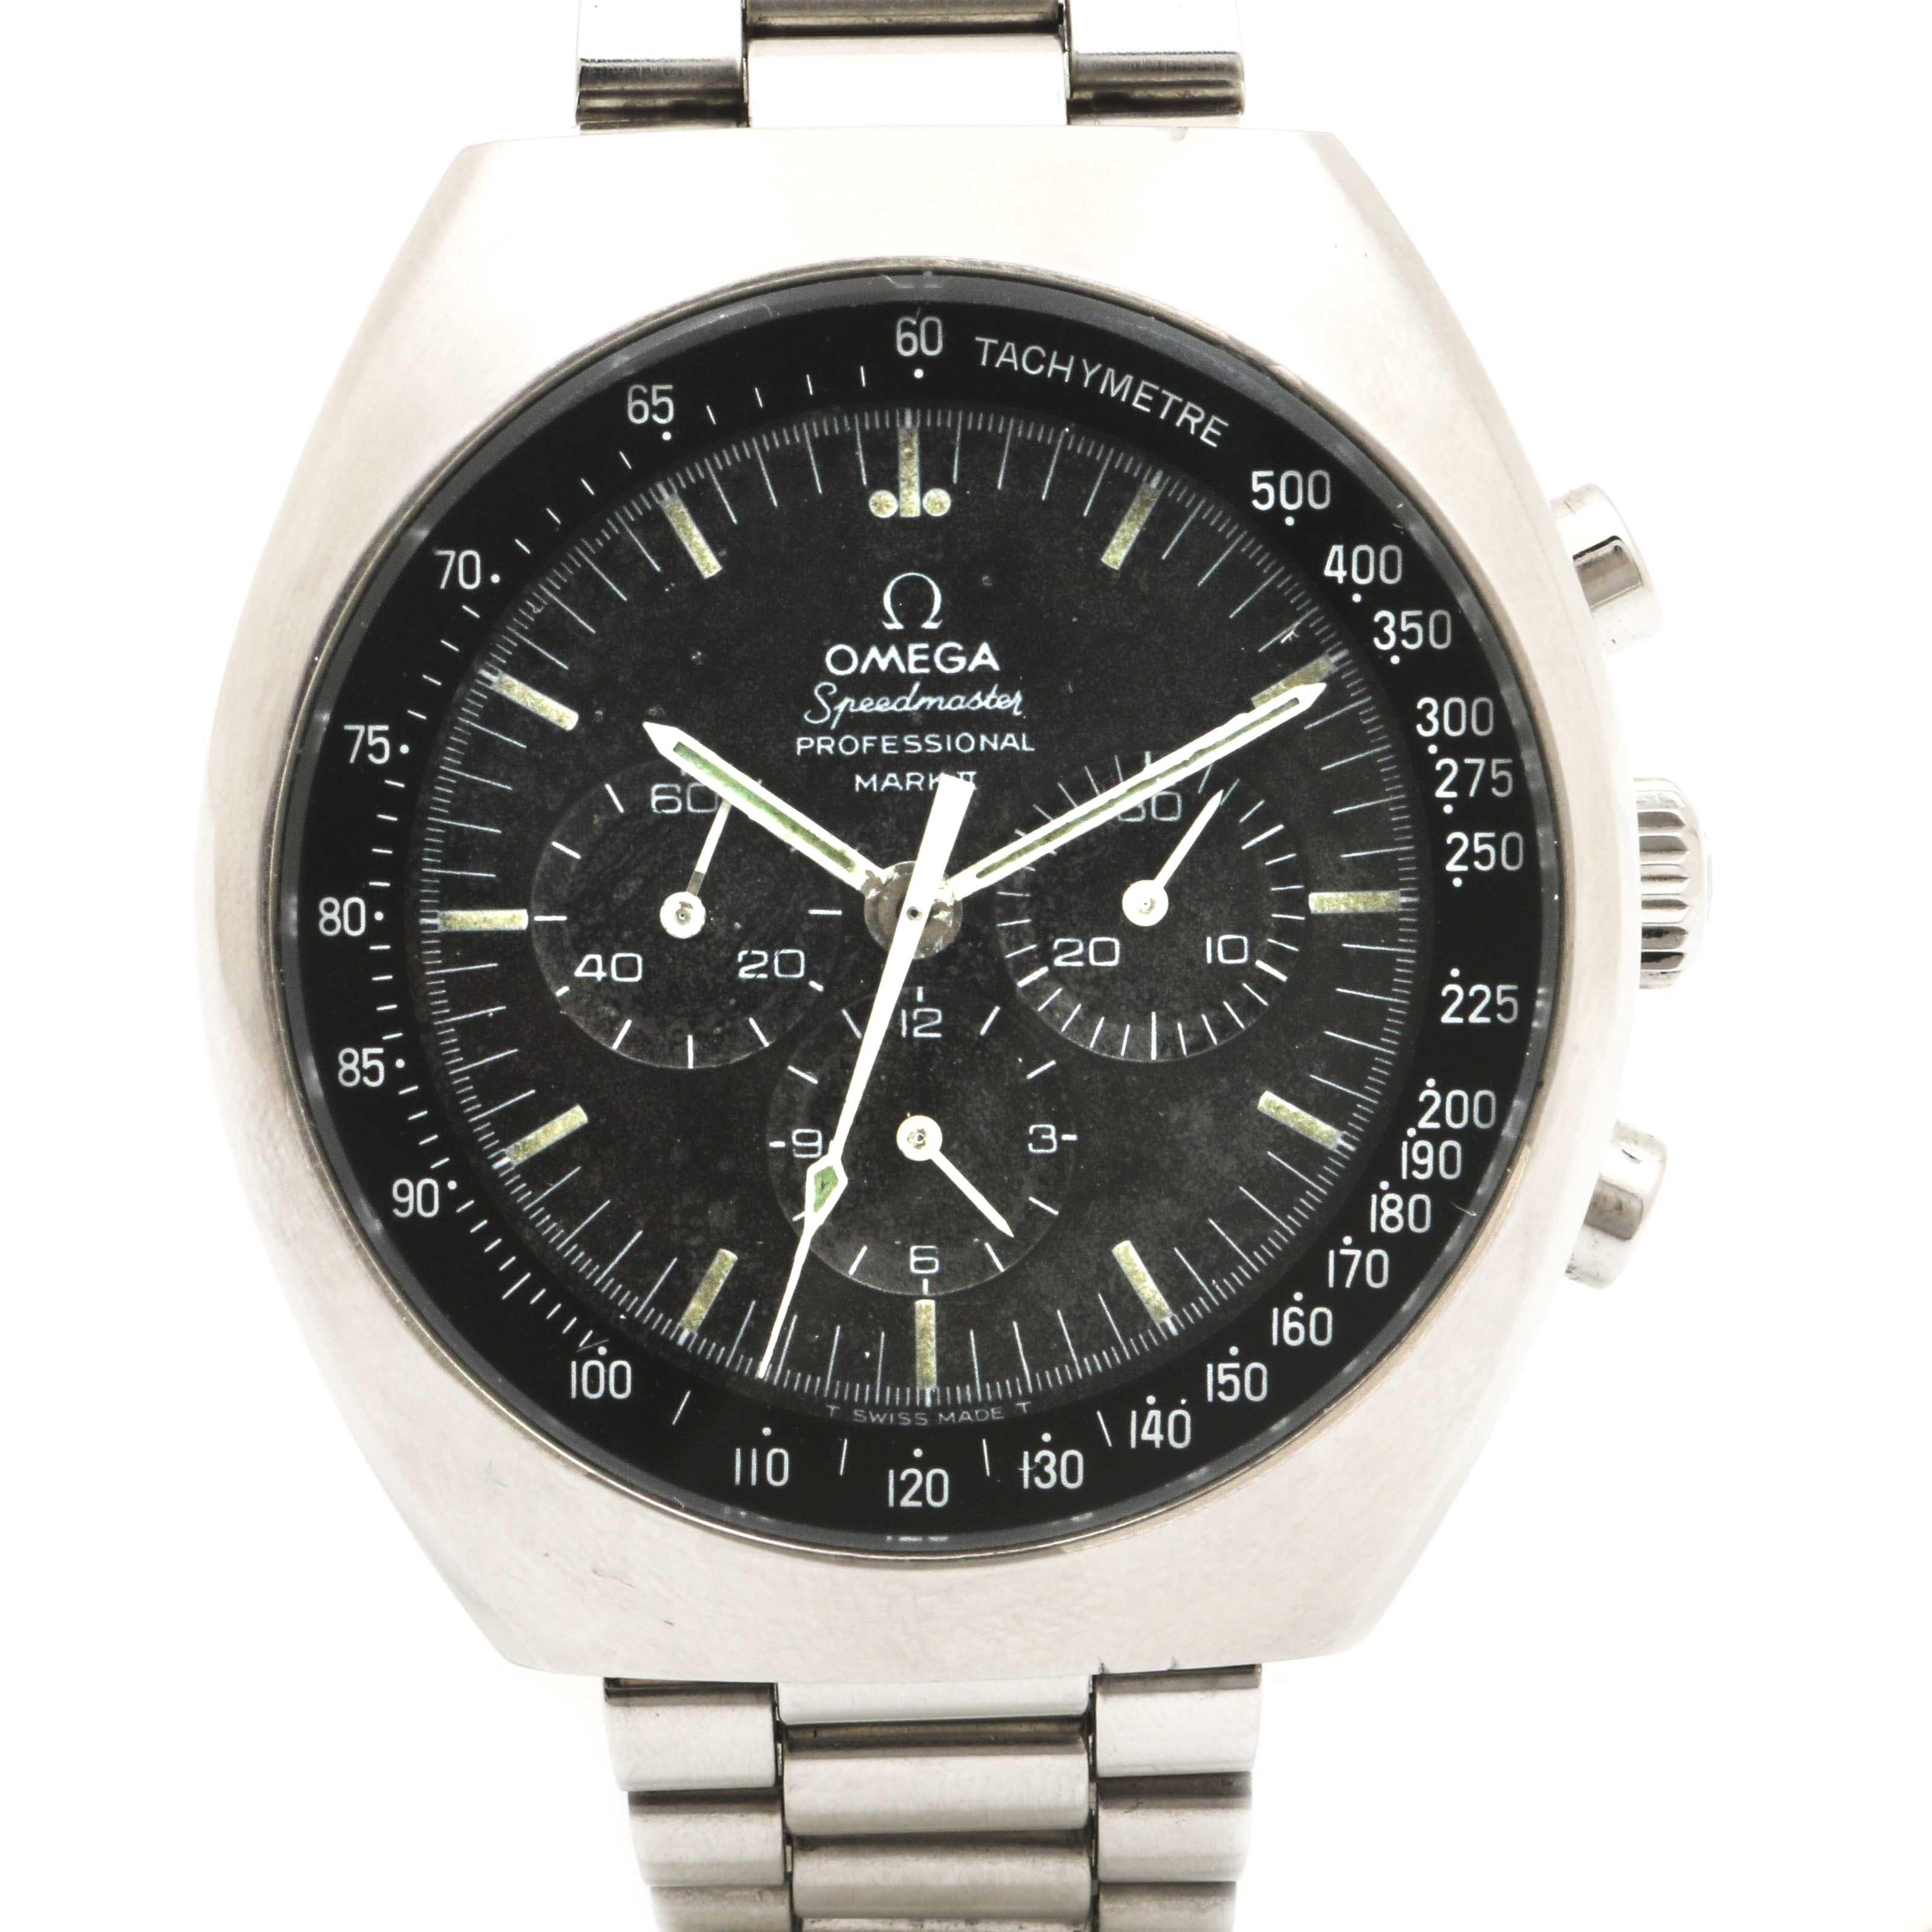 Omega Speedmaster Professional Mark II Chronograph Wristwatch